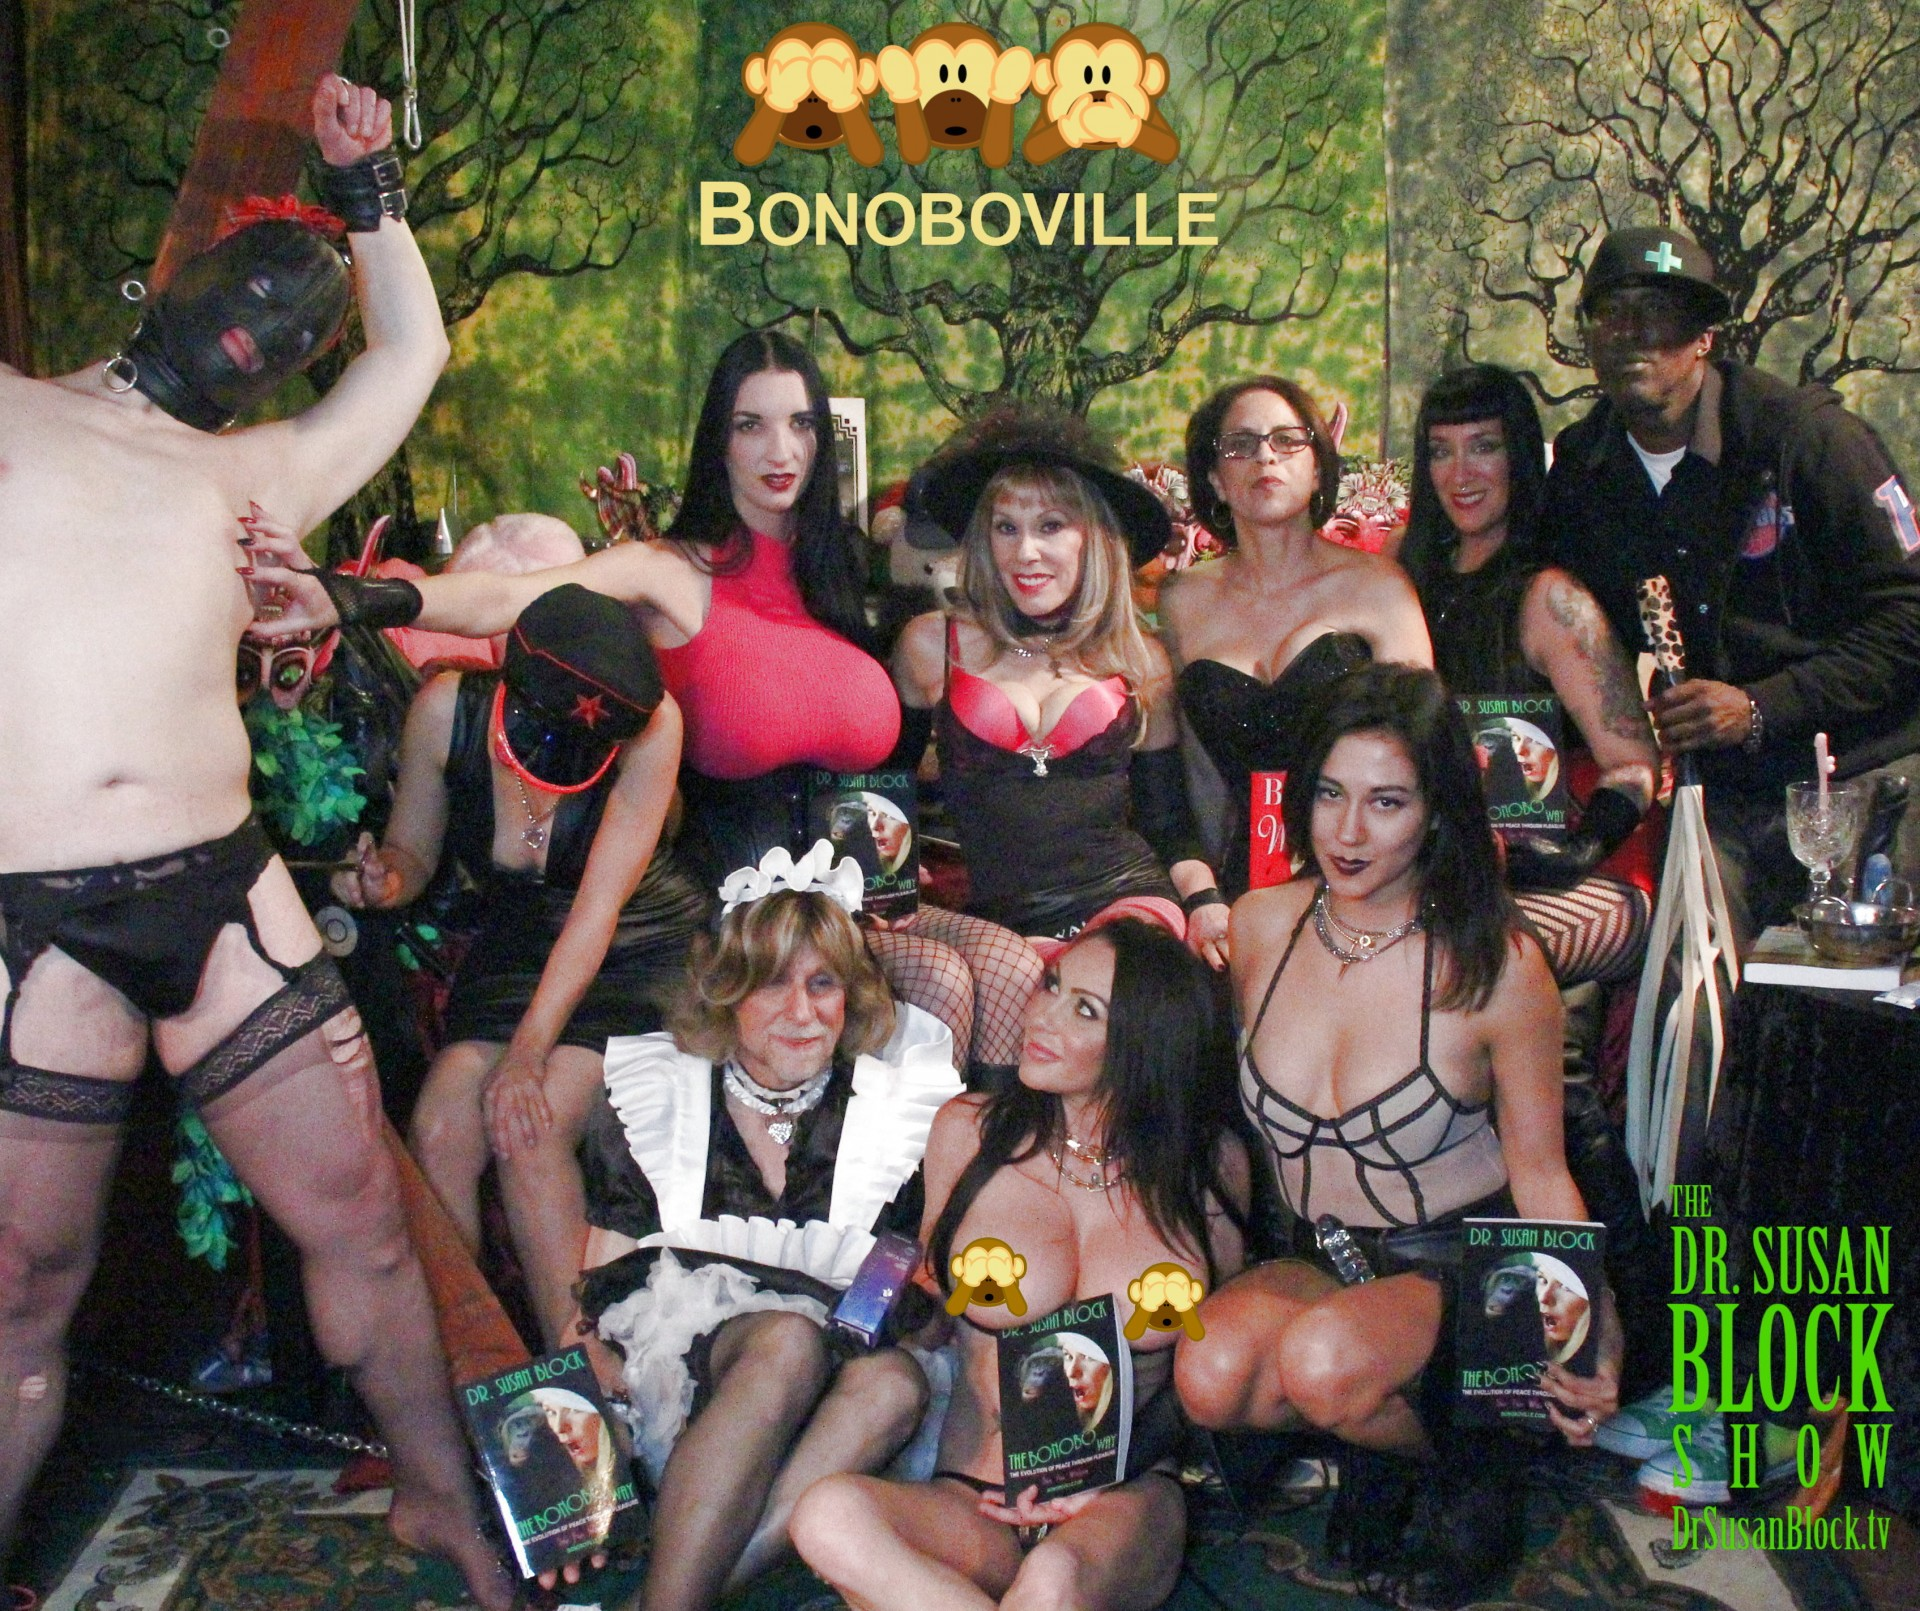 Goddess Fae Black & the Bonoboësque FemDom 4 on DrSuzy.Tv!